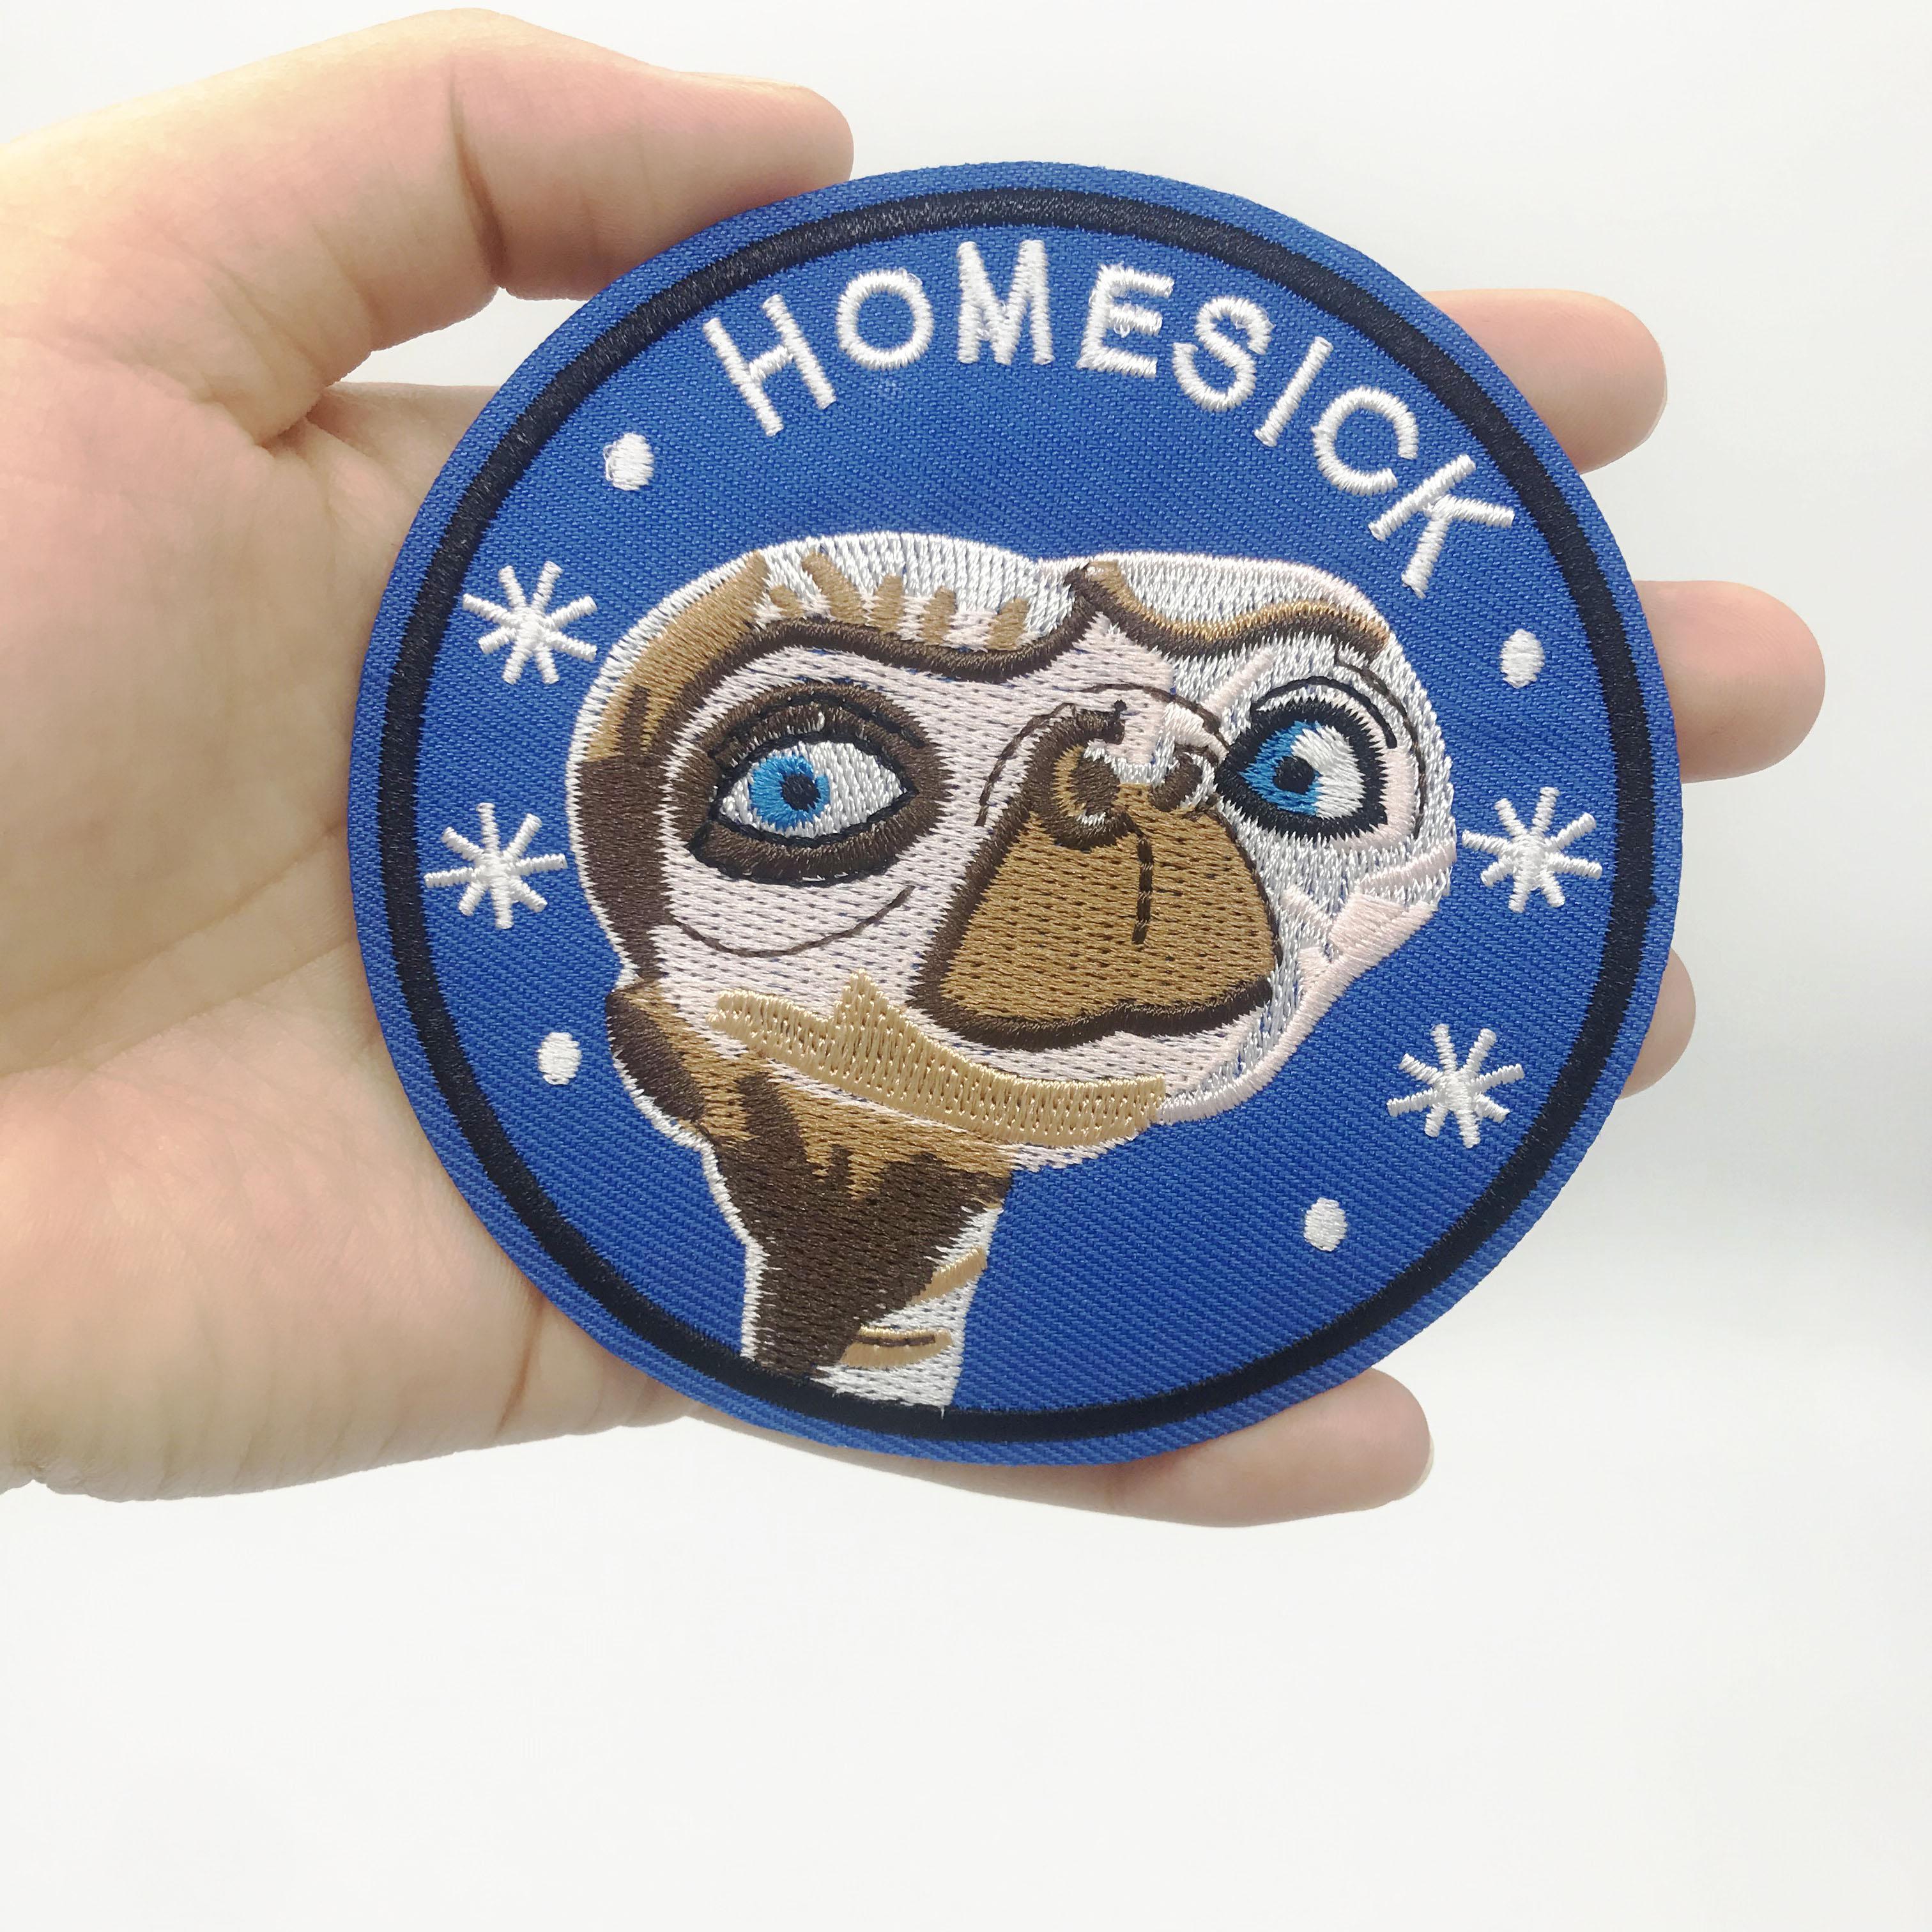 Купить с кэшбэком Embroidered Patch Badge Alien HomeSick sewing Iron on clothes badge collection badge